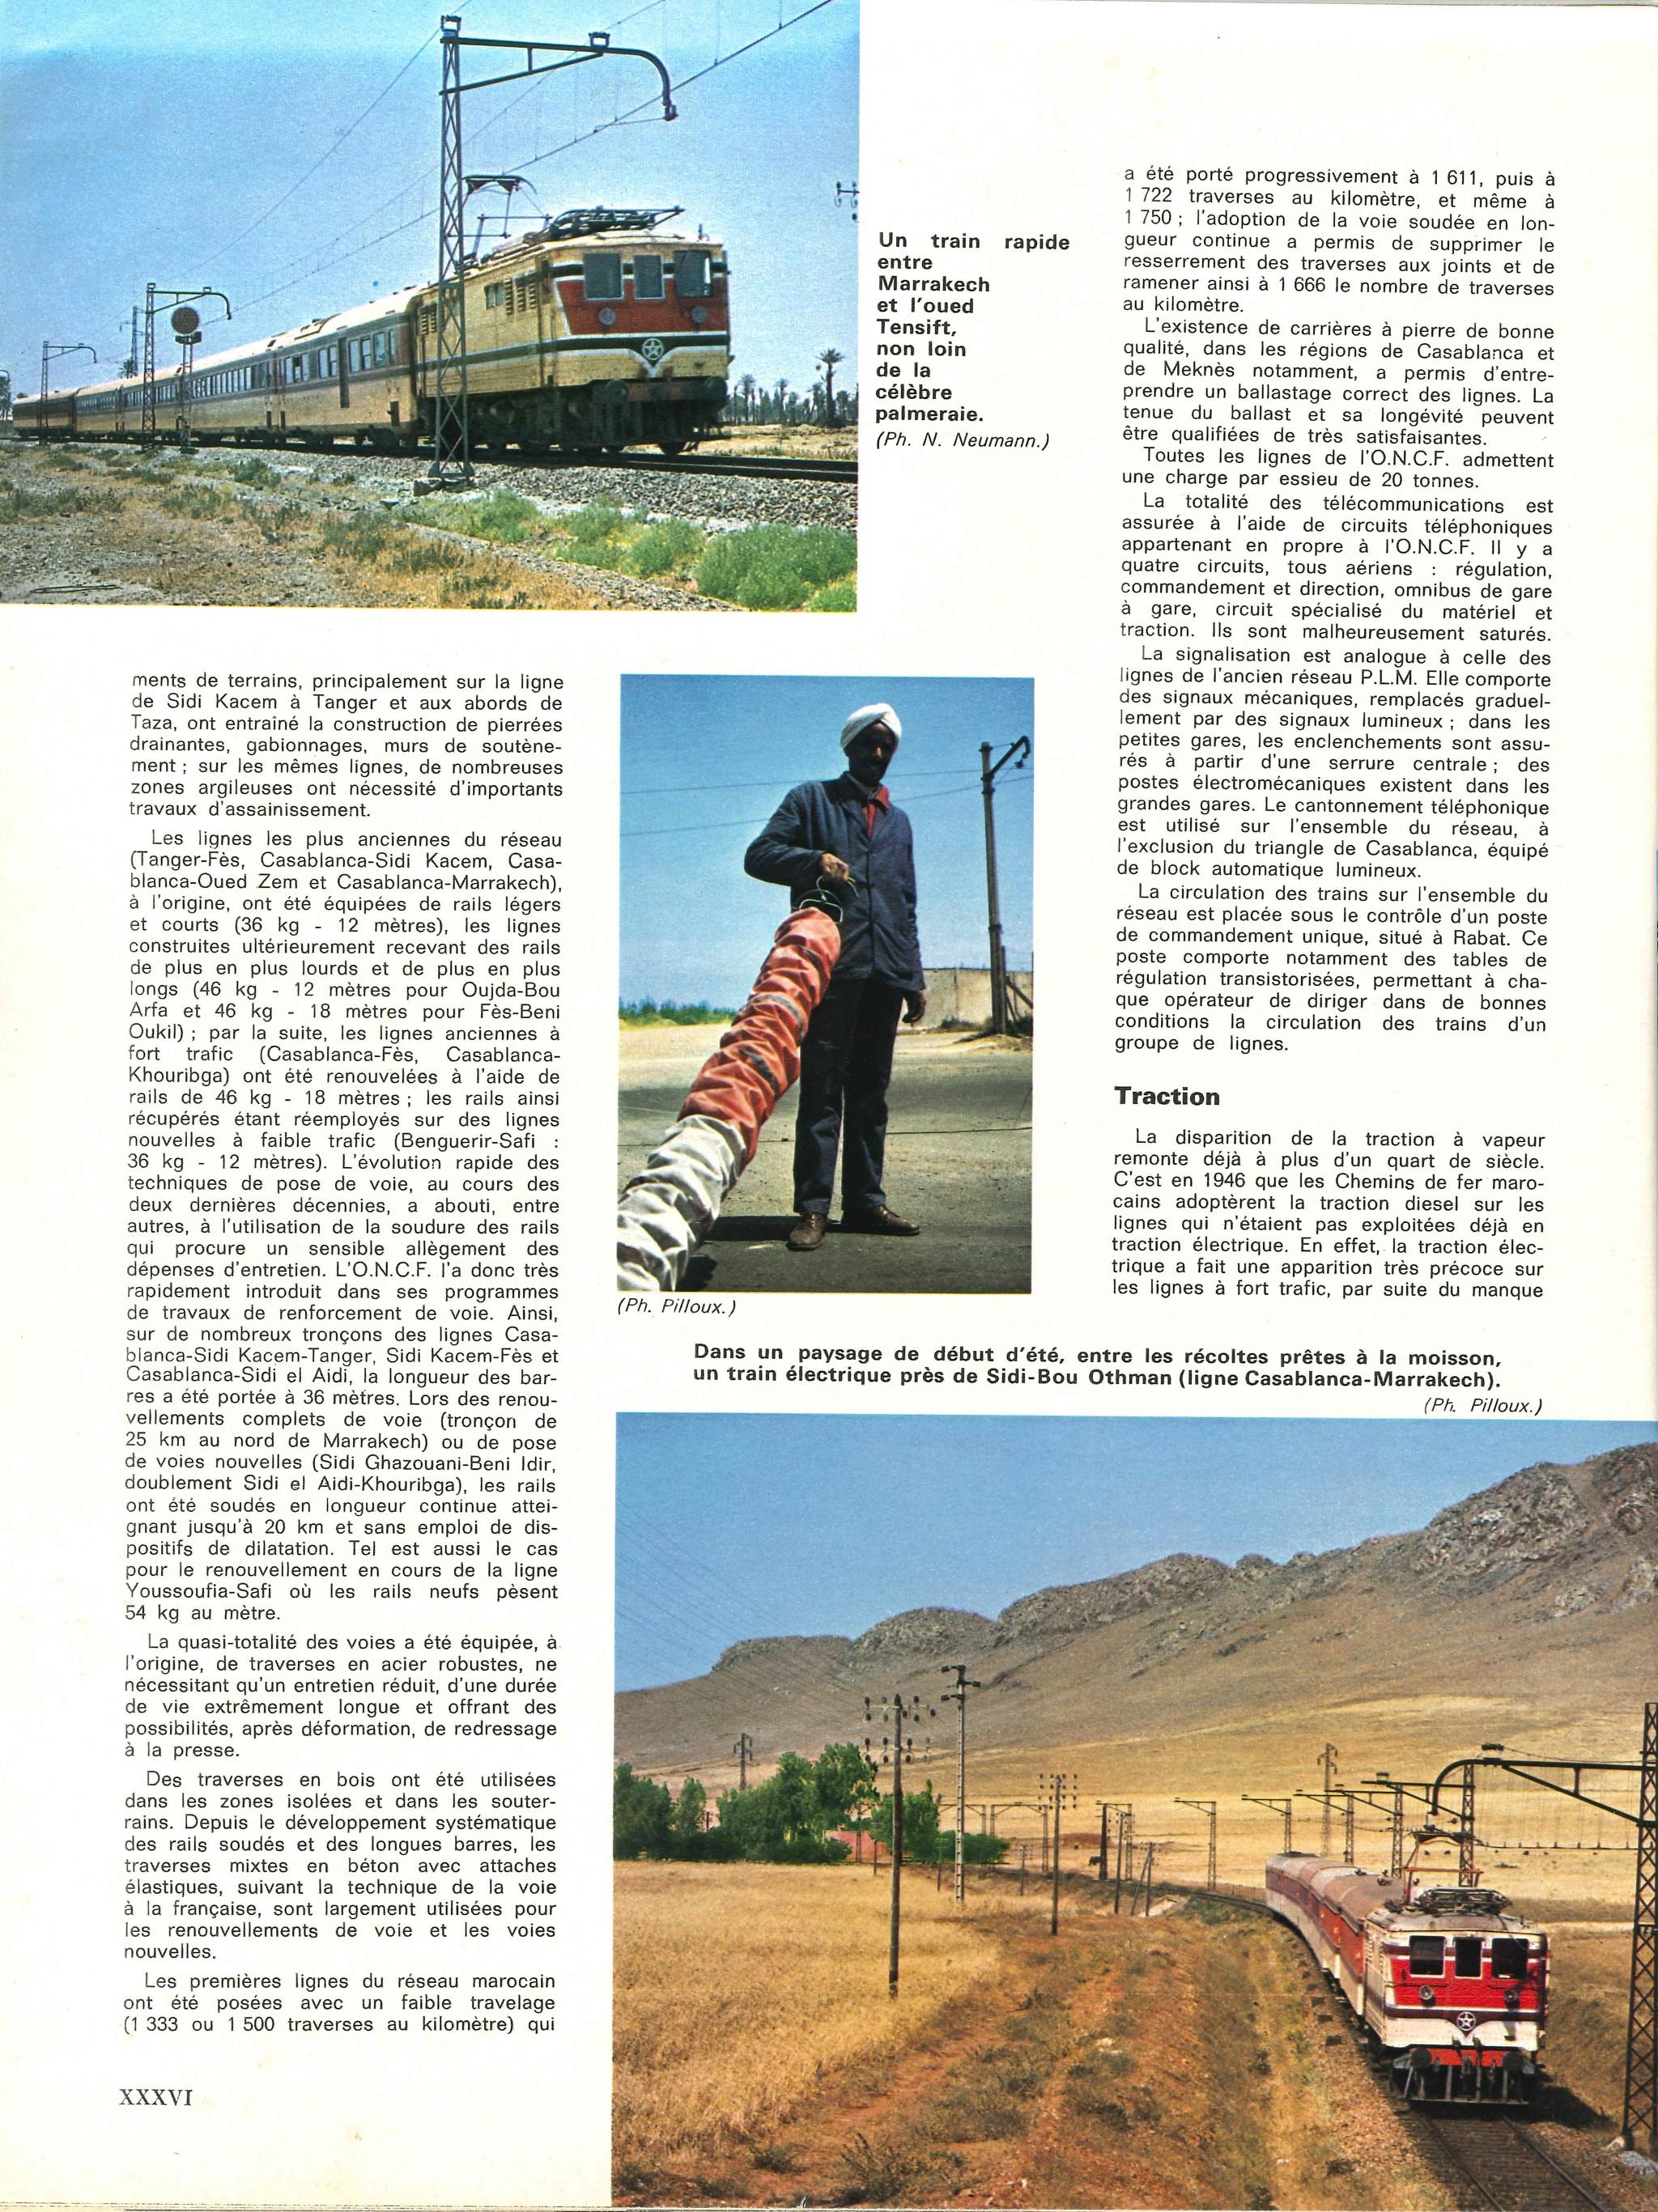 Chemins de Fer au Maroc - ONCF  - Page 2 49429346973_0a206b1daa_3k